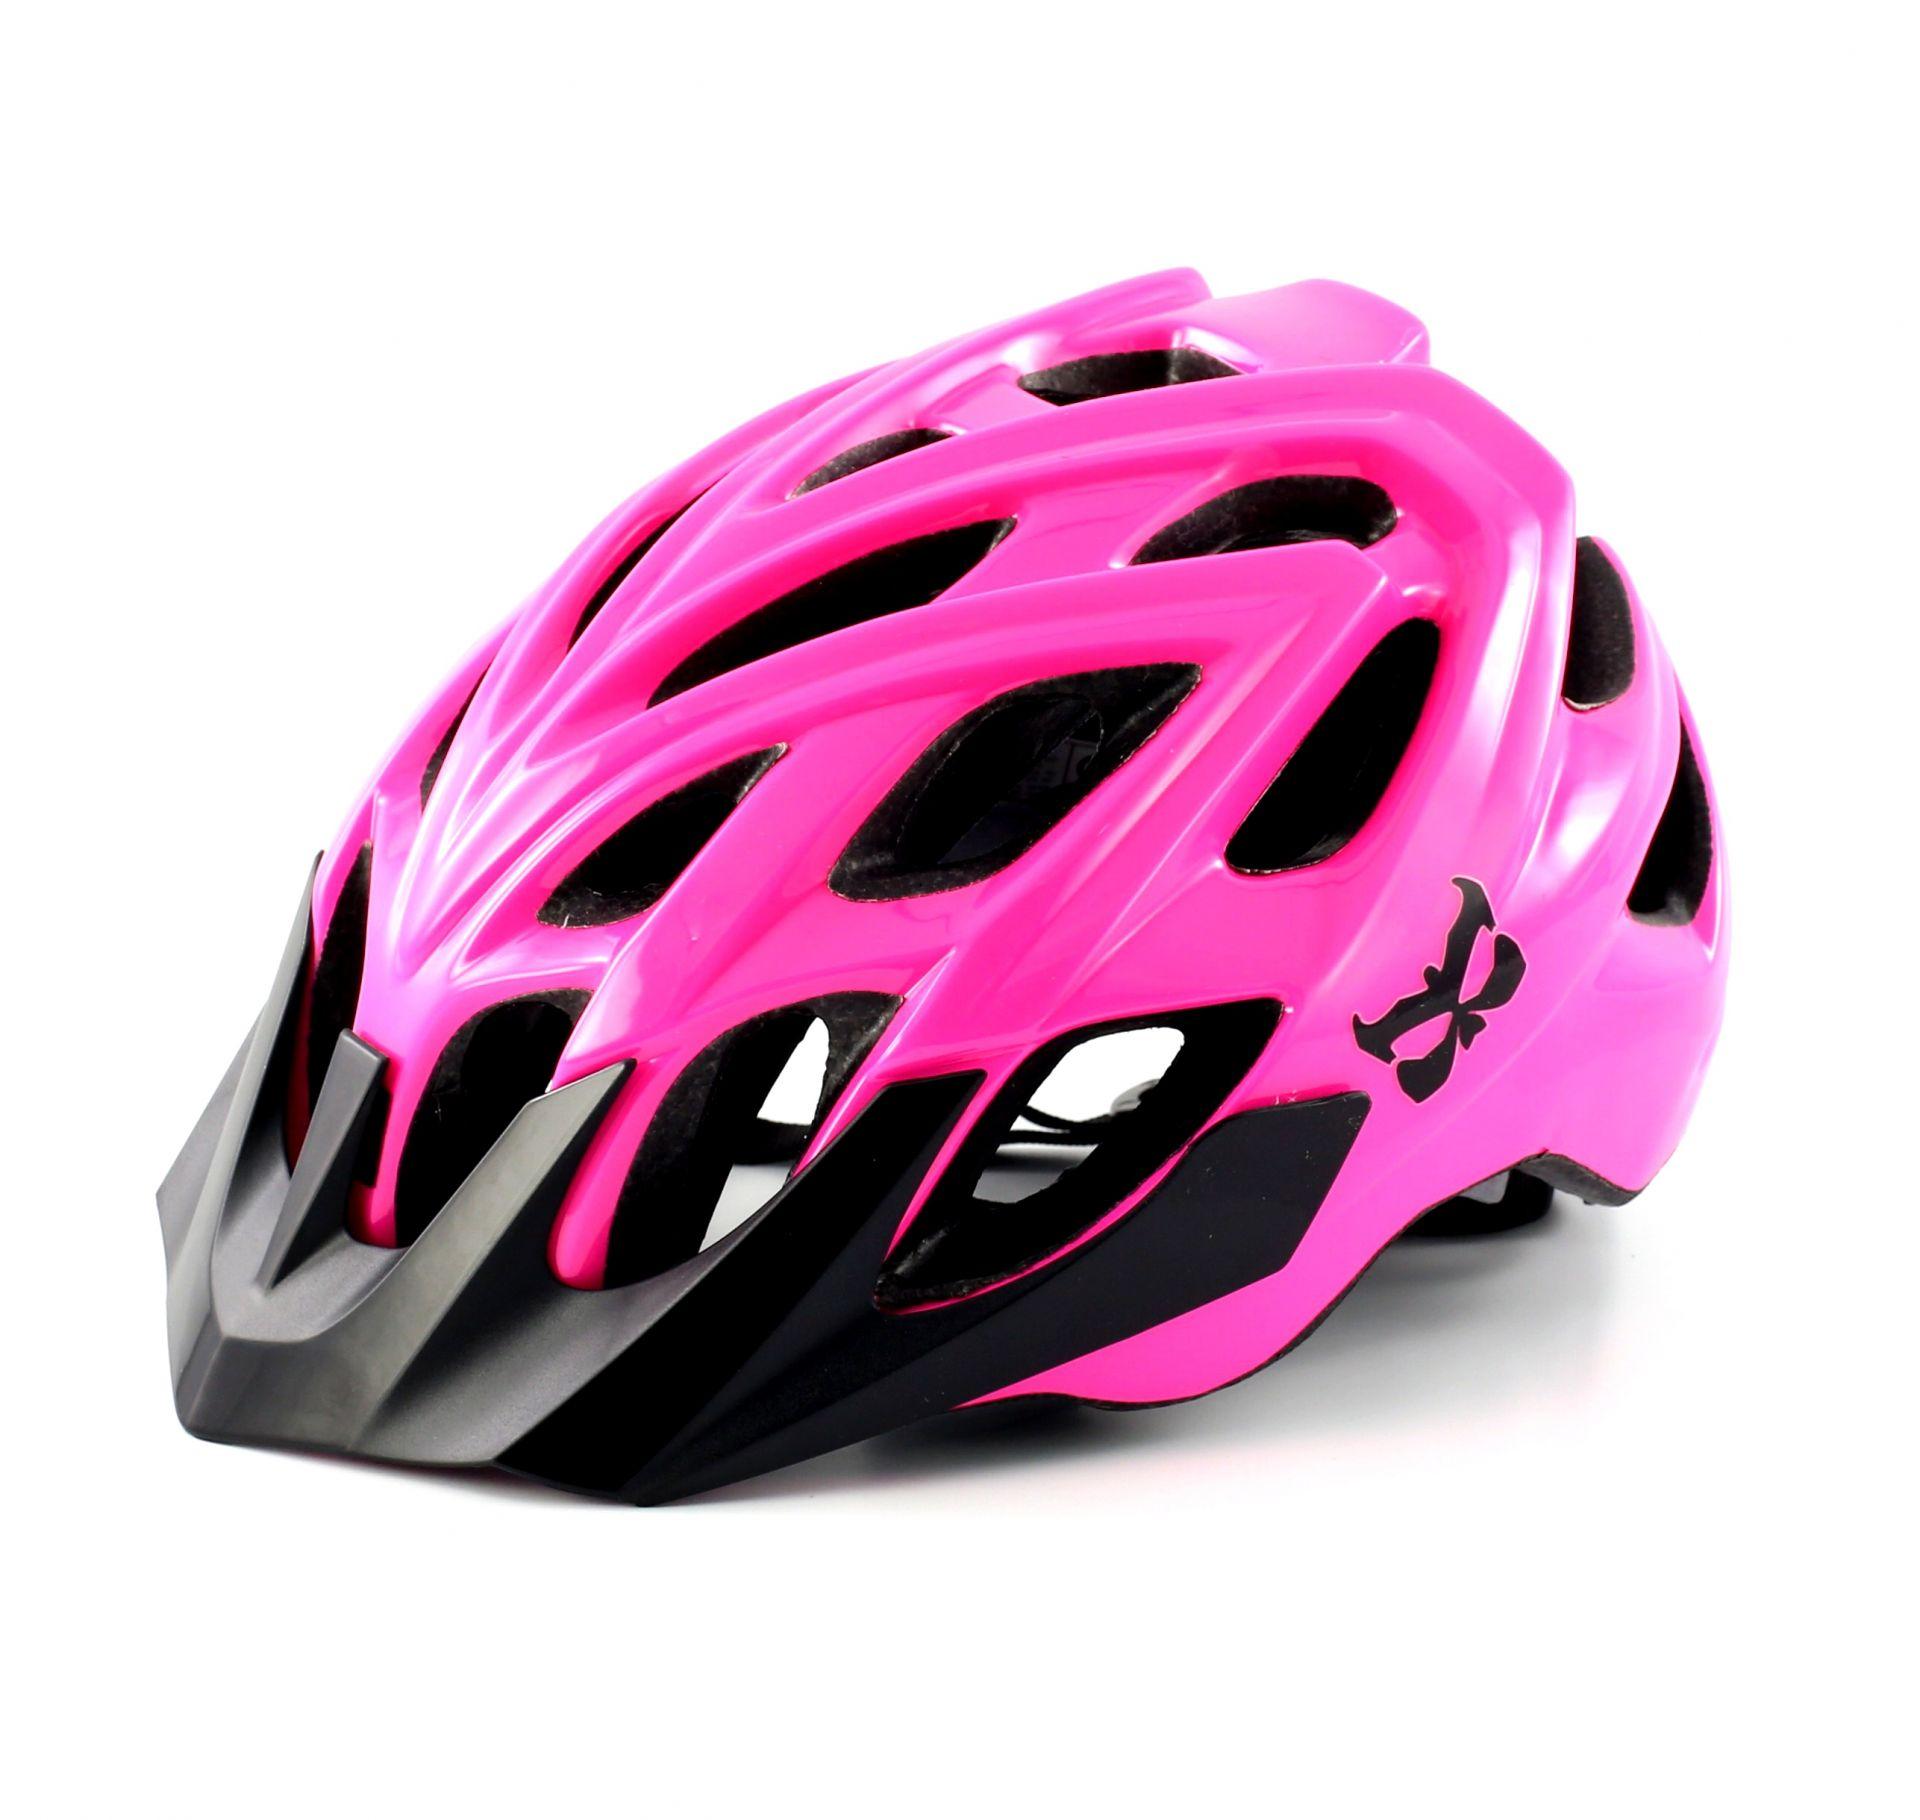 Casque Kali Protectives Chakra Logo Pink - XS/S (50-54)